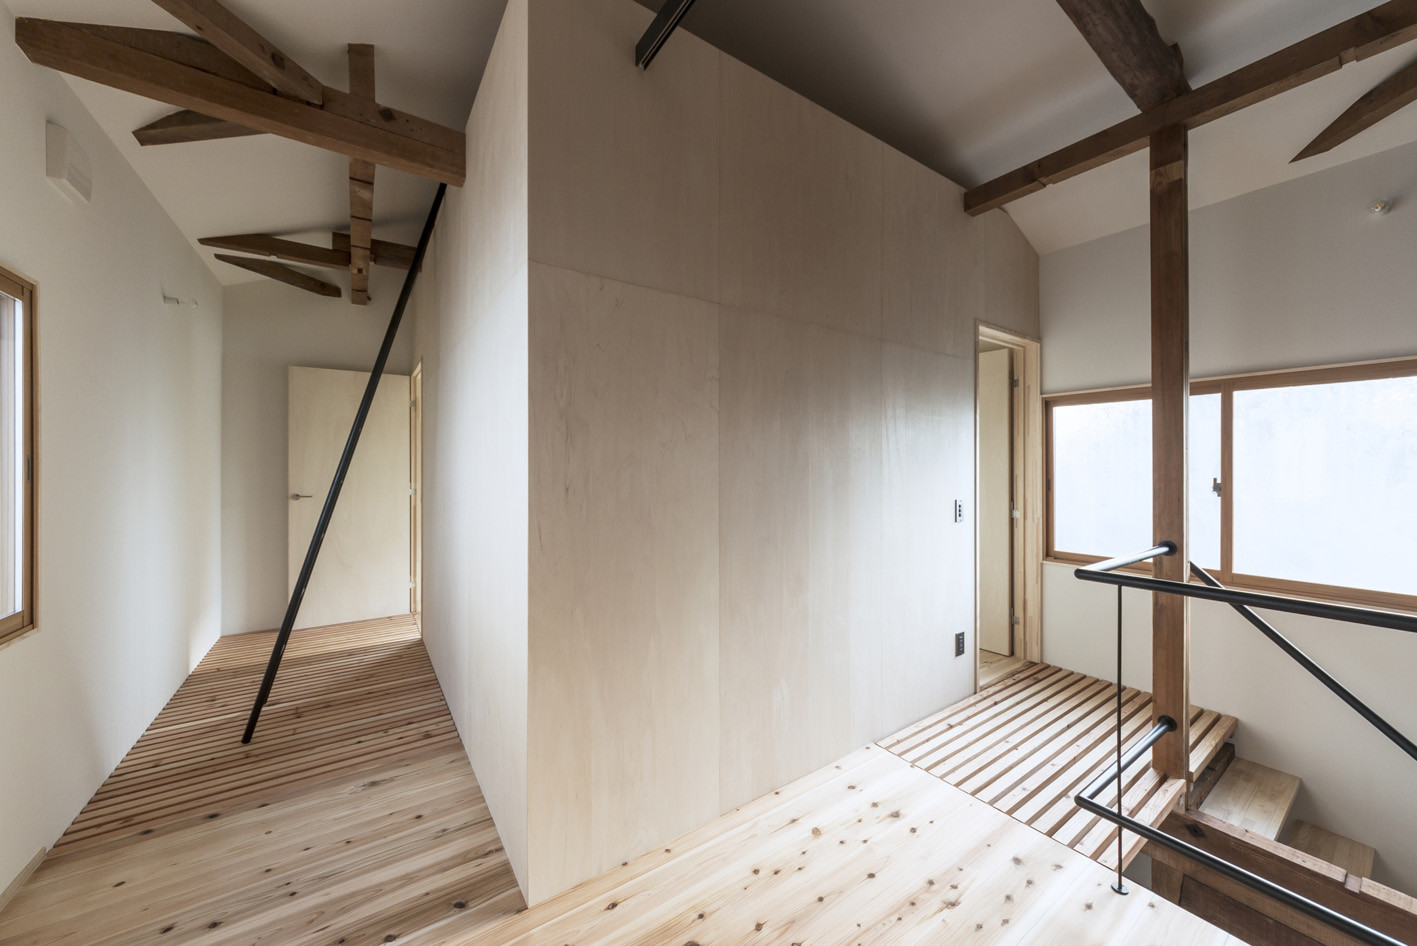 House Renovation in Osaka / Coil Kazuteru Matumura Architects, © Yoshiro Masuda